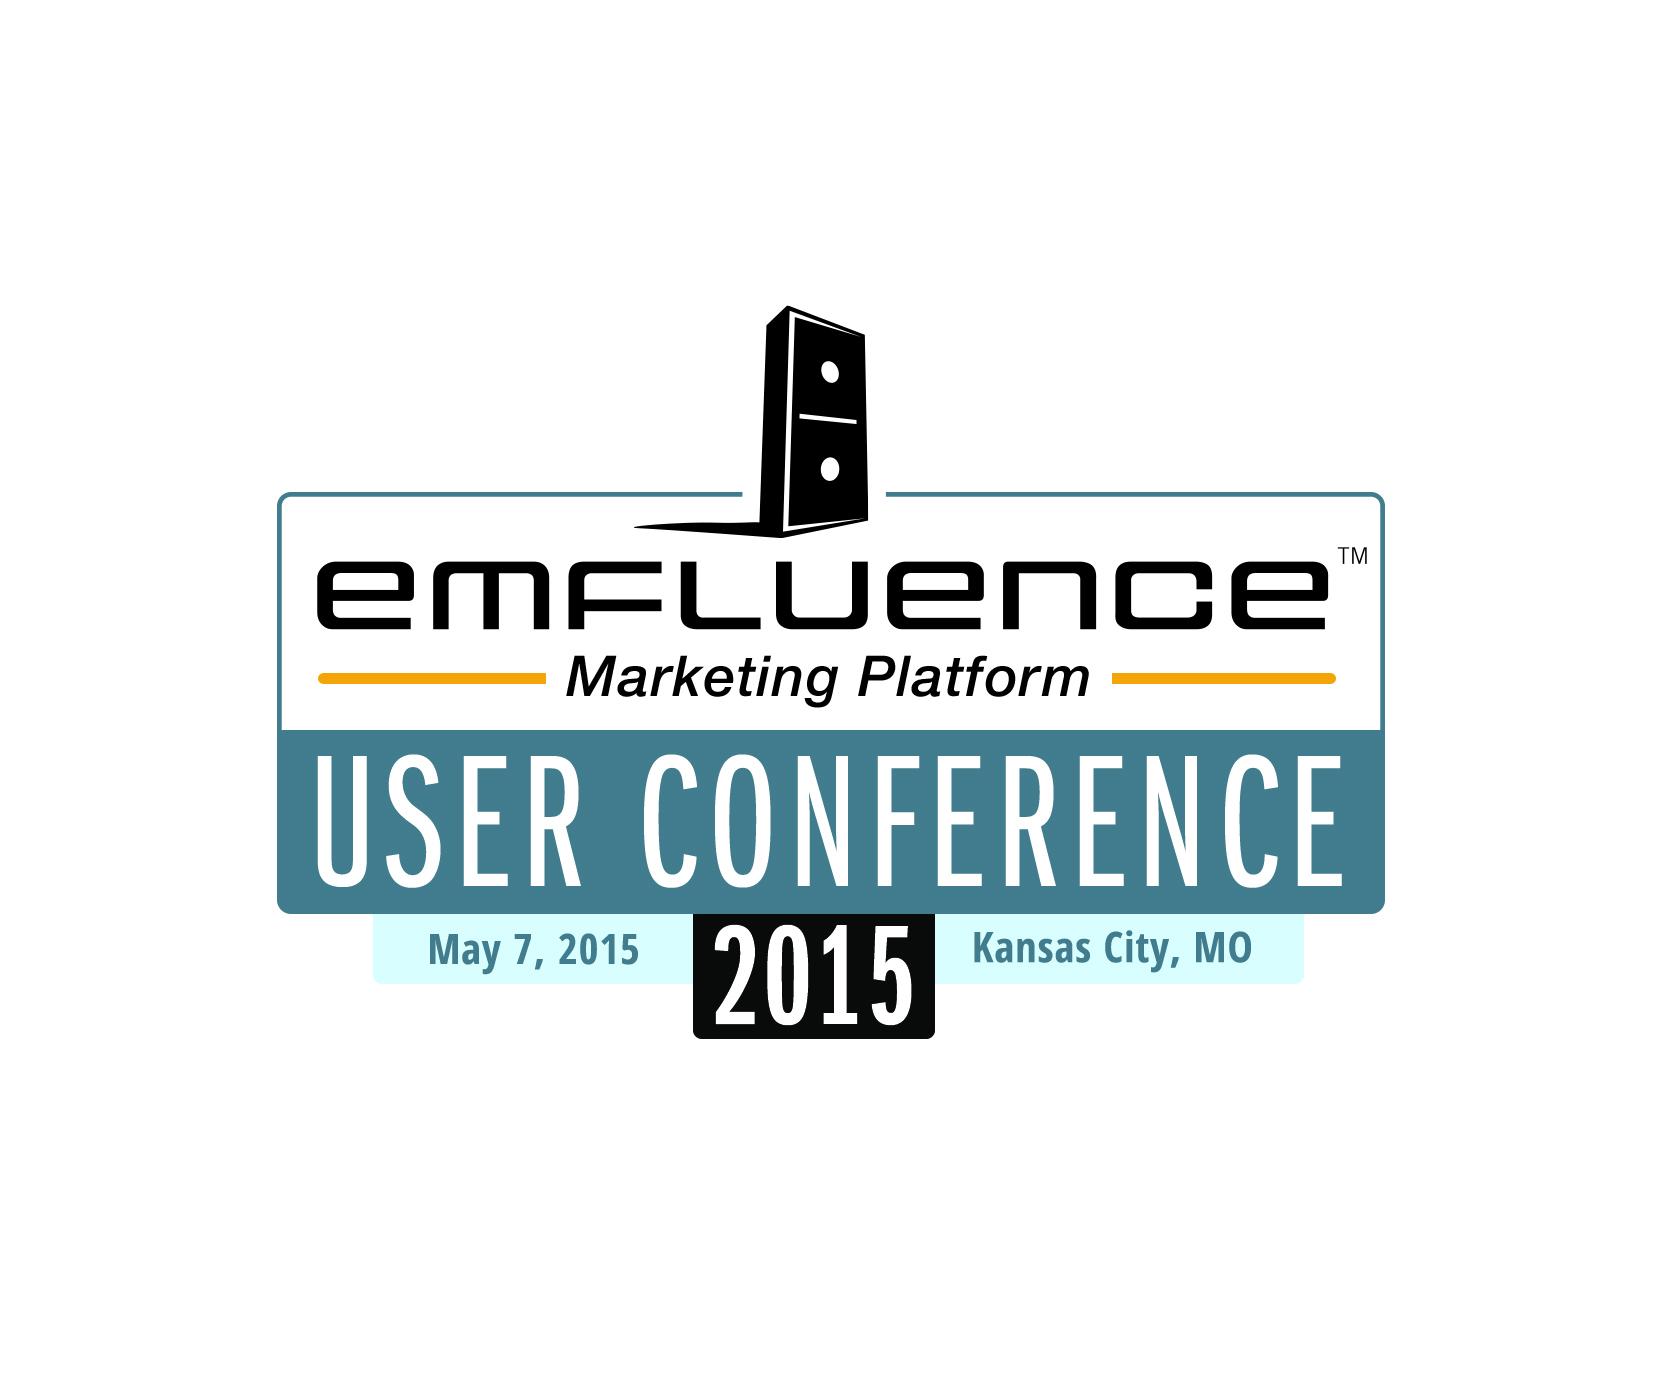 Graphic from Emfluence marketing platform user conference May 7, 2015 Kansas City MO.